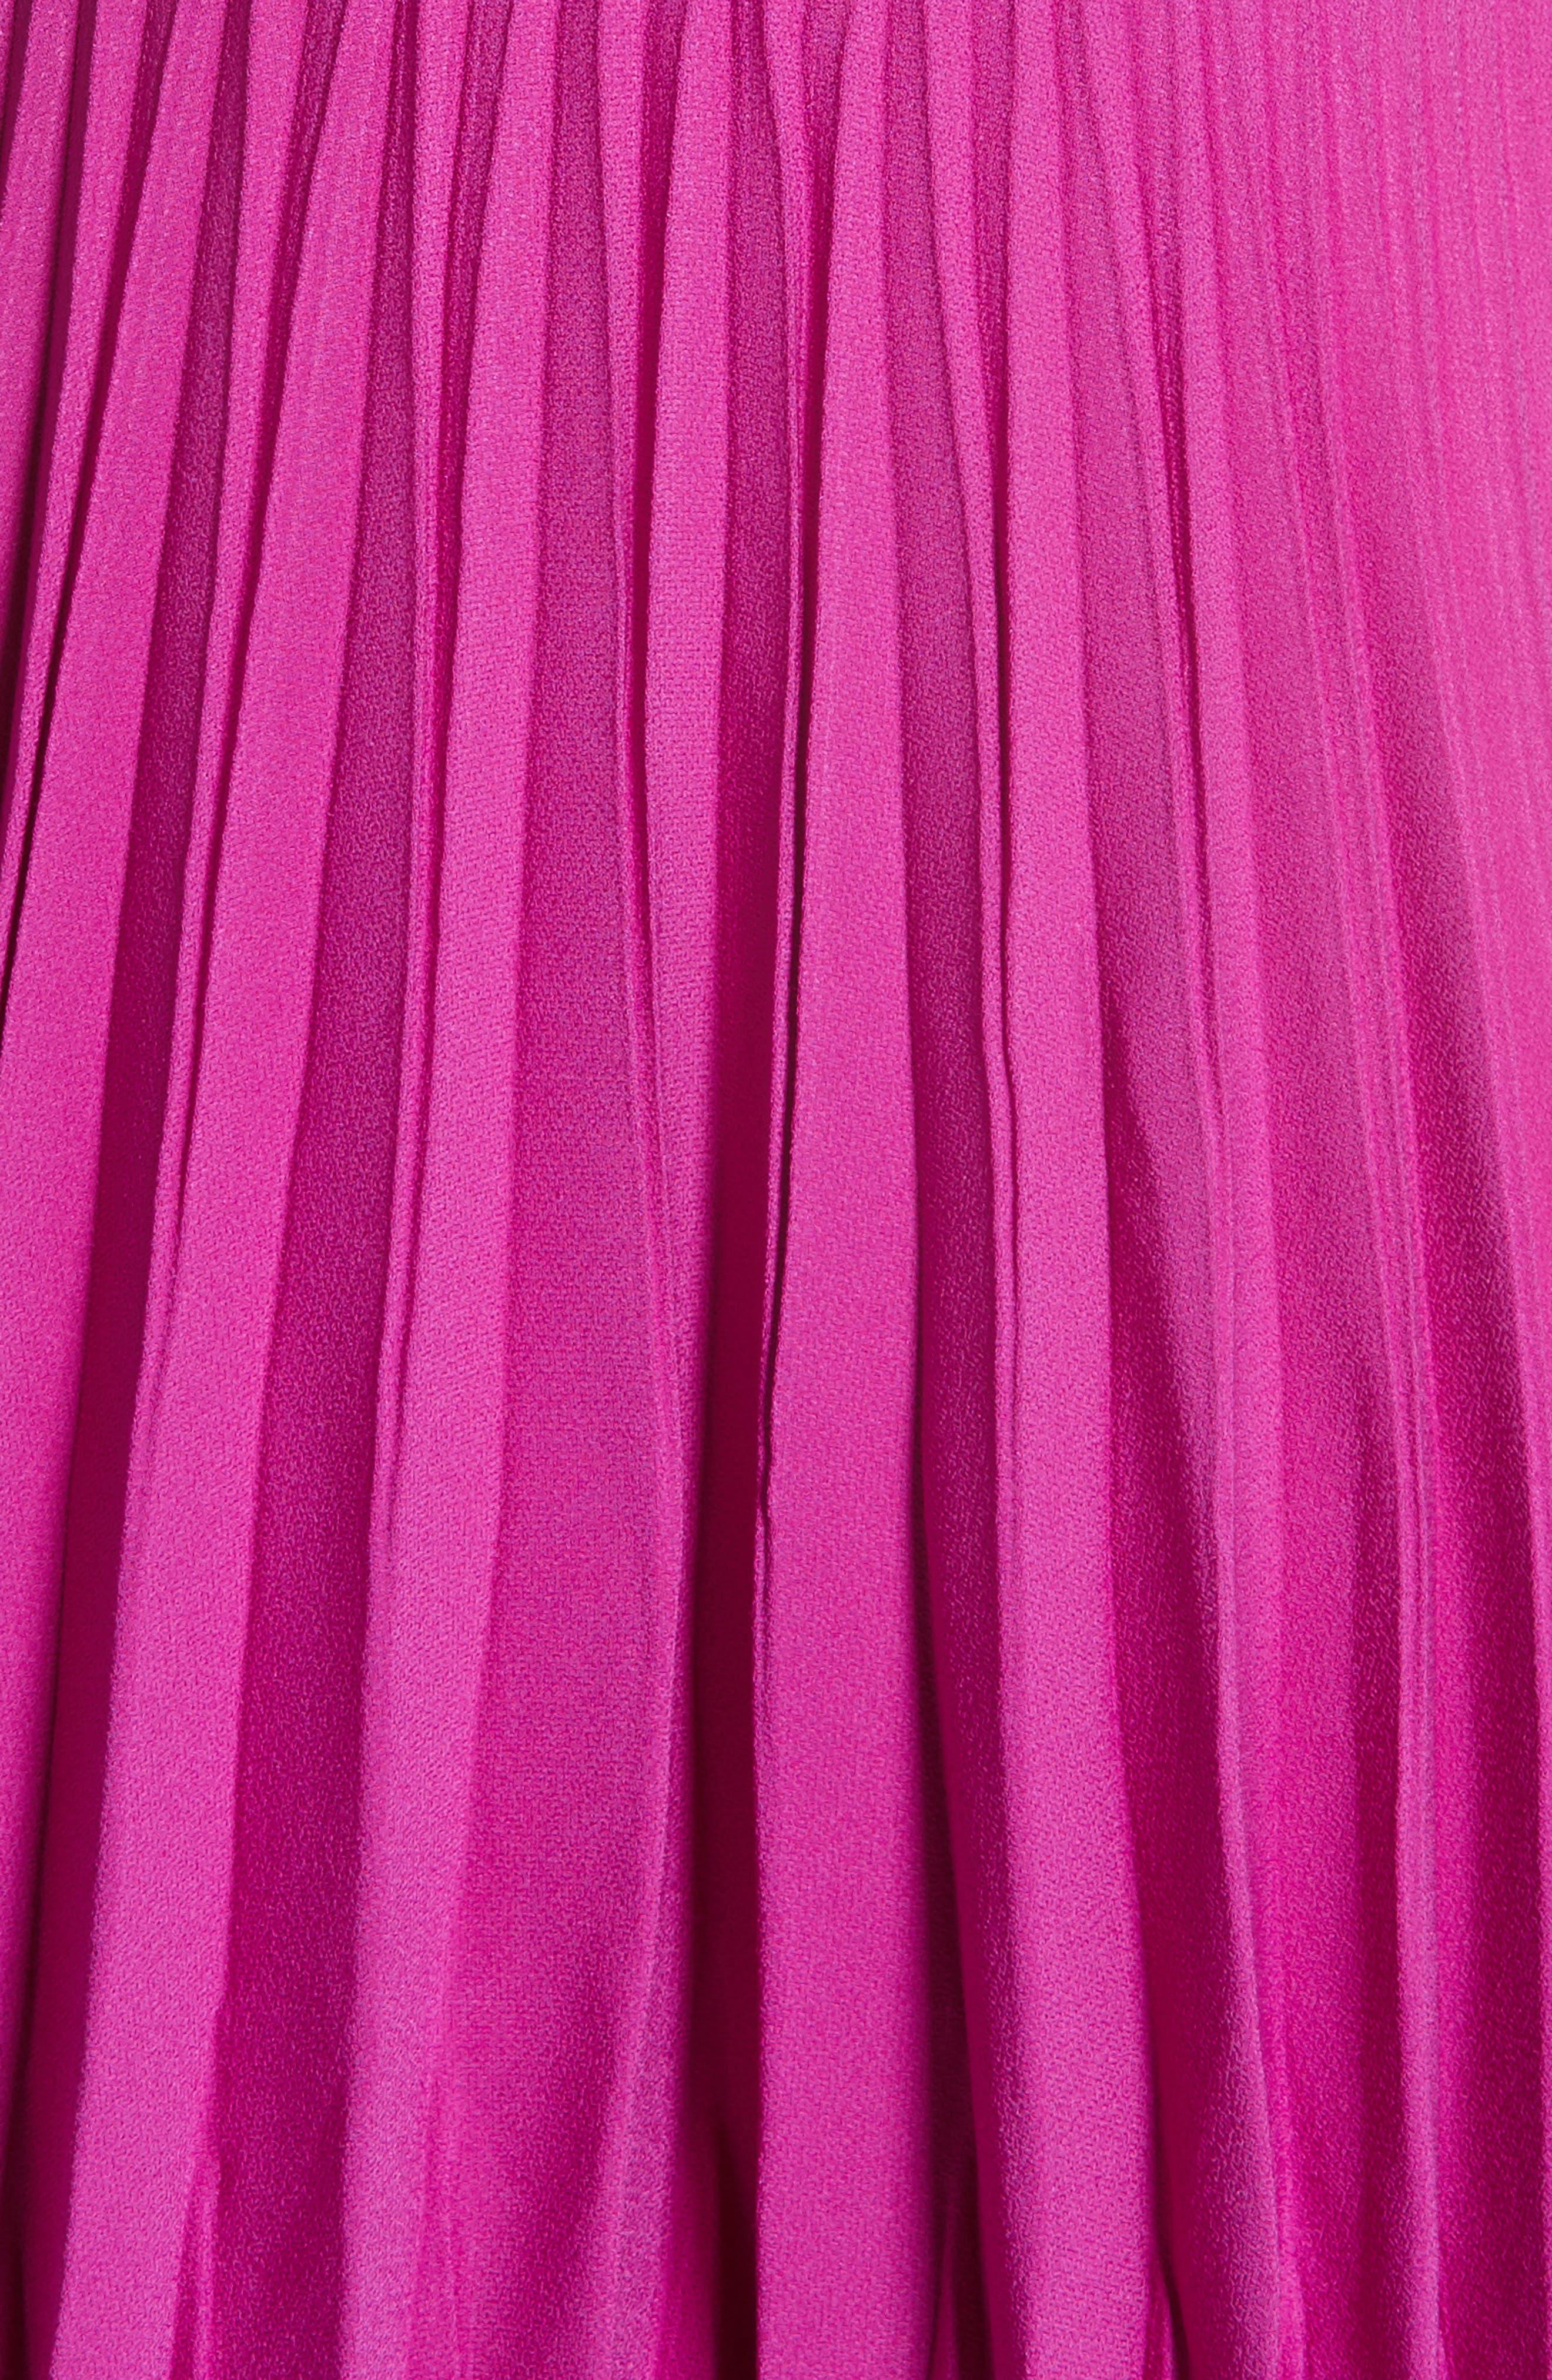 Ruffle & Pleated Midi Dress,                             Alternate thumbnail 5, color,                             651